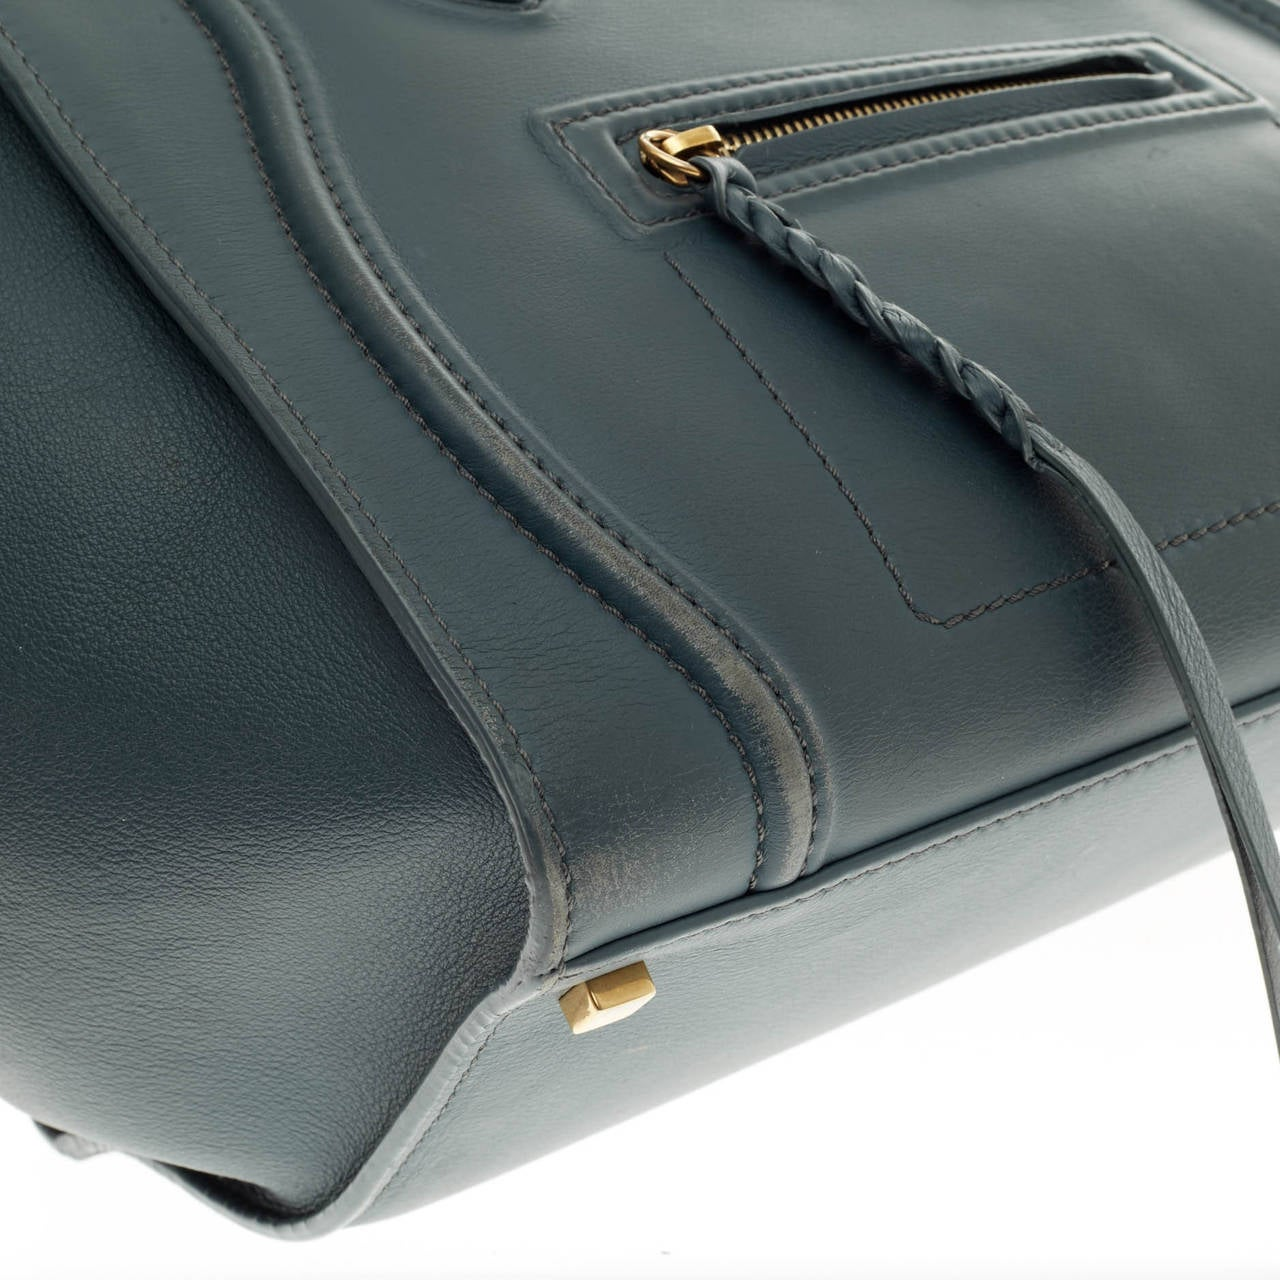 Celine Phantom Smooth Leather Large 8